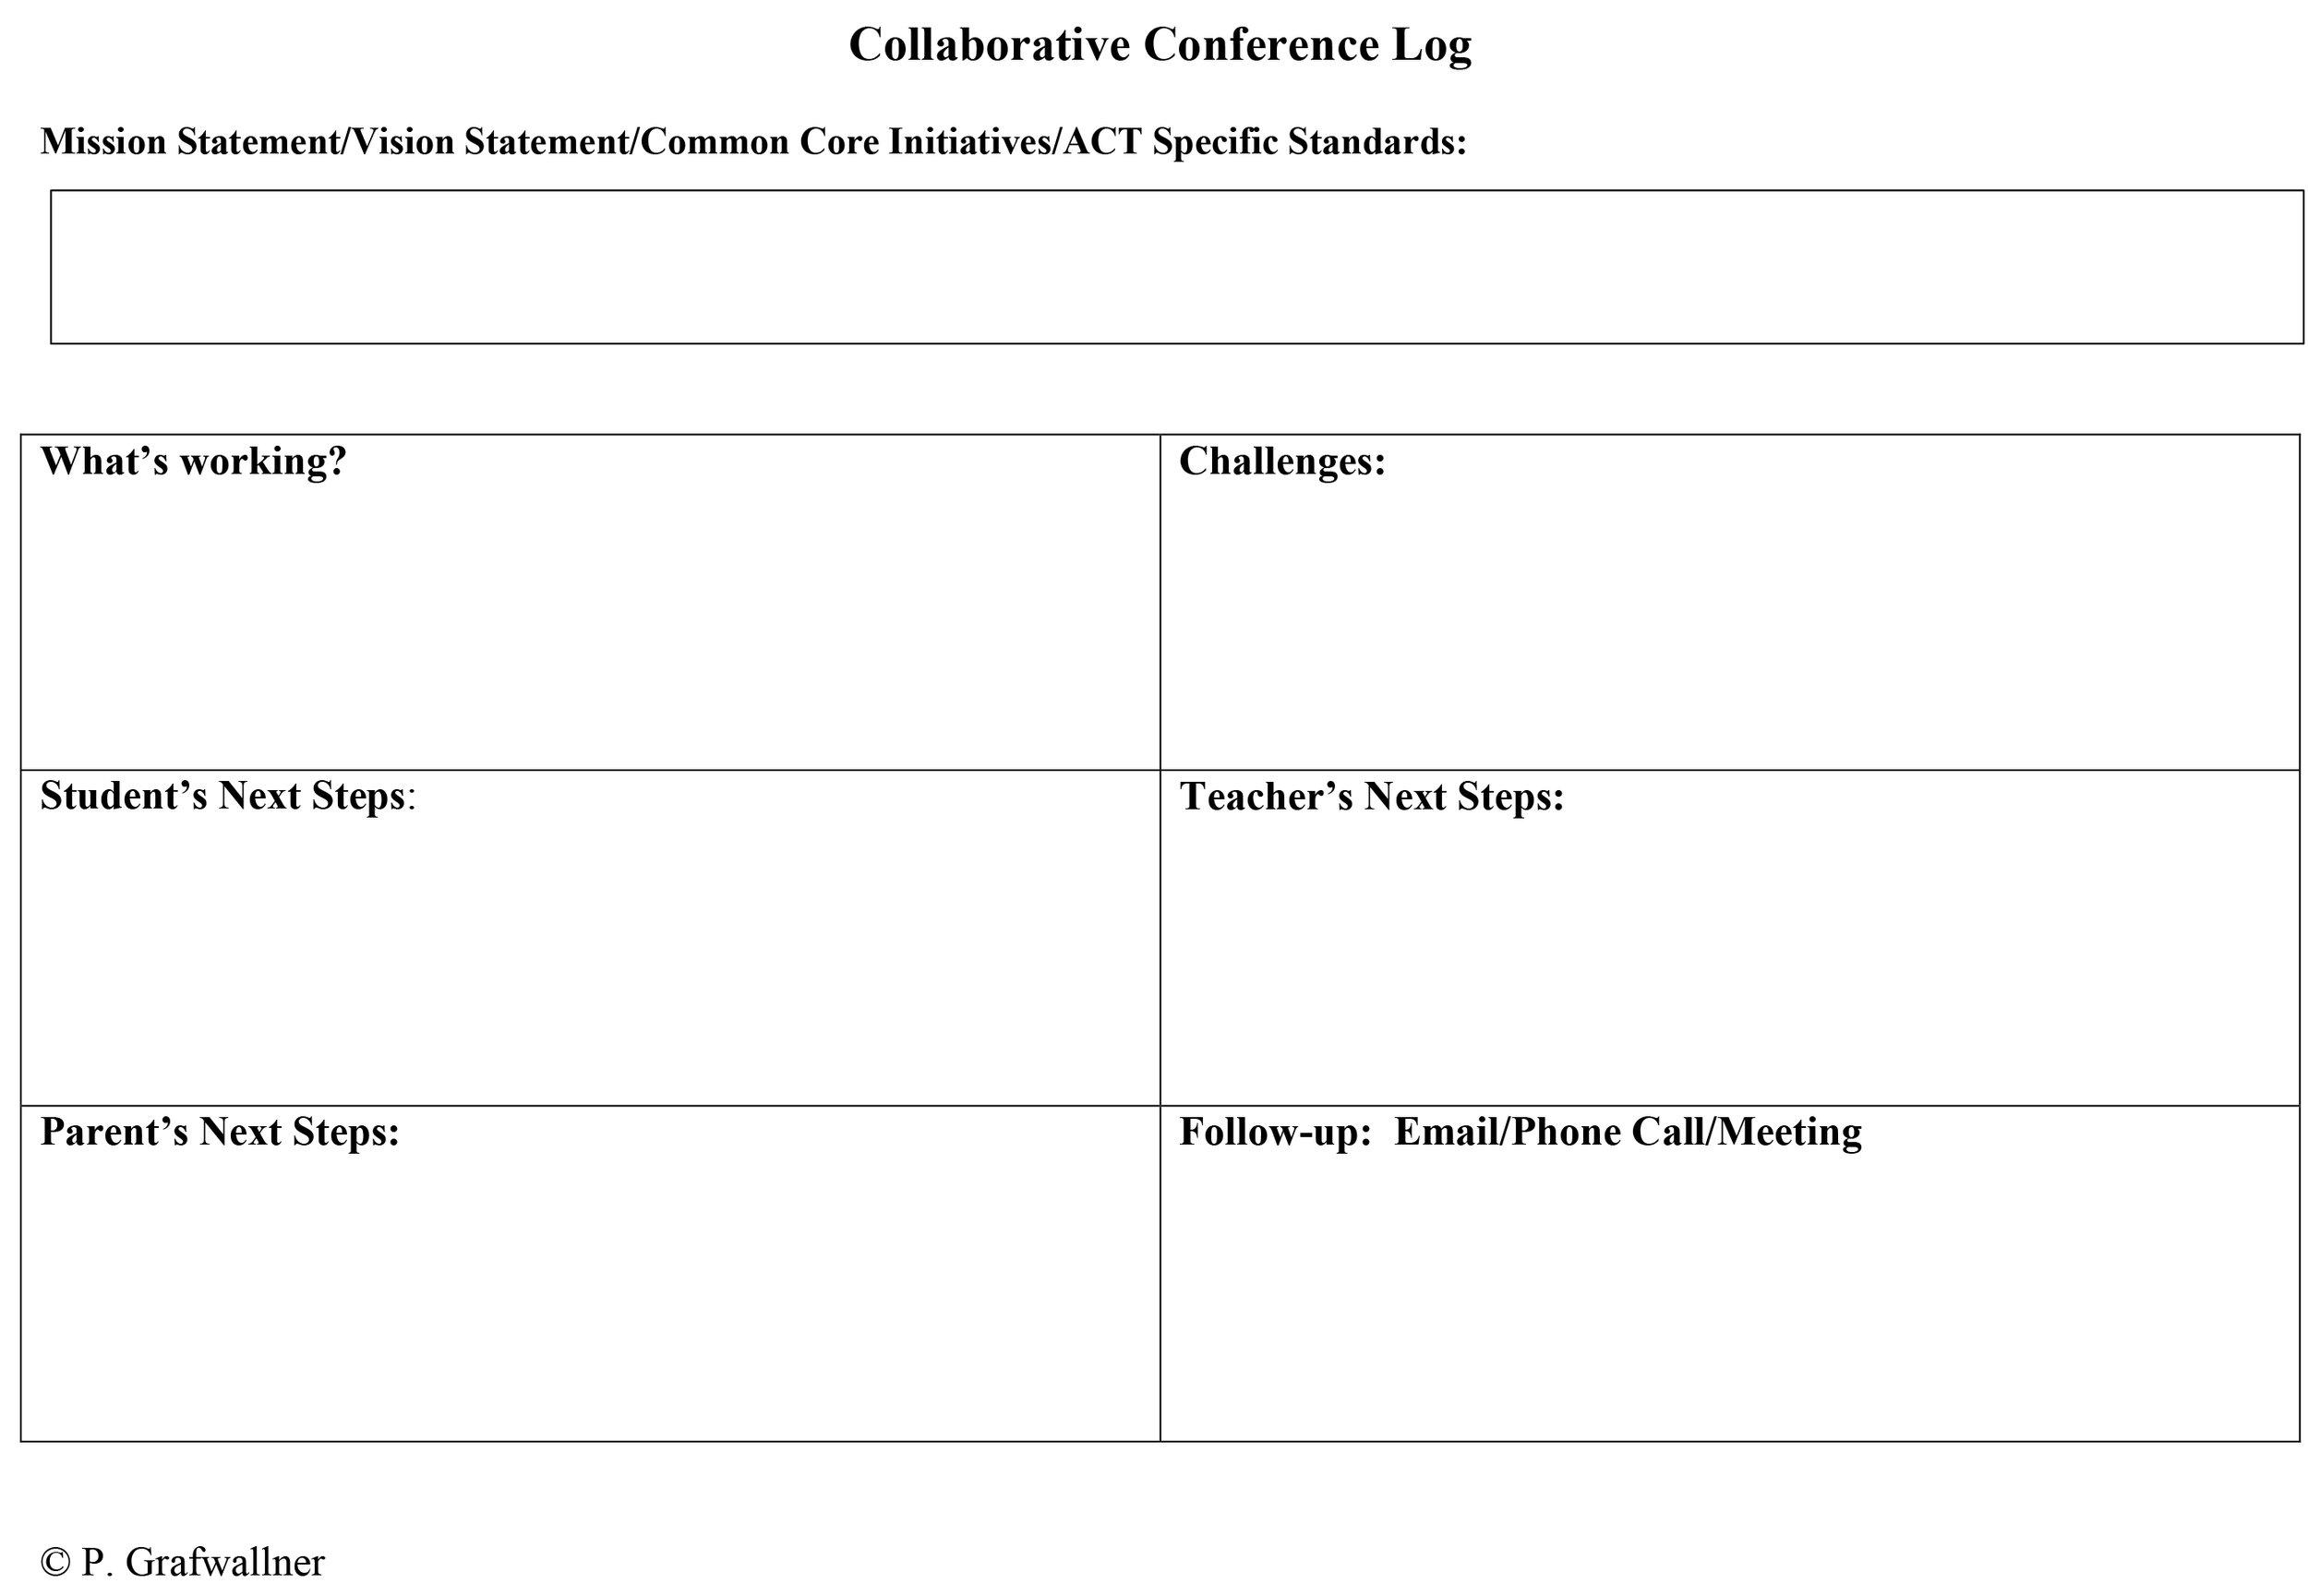 Collaborative Conference Log-1.jpg